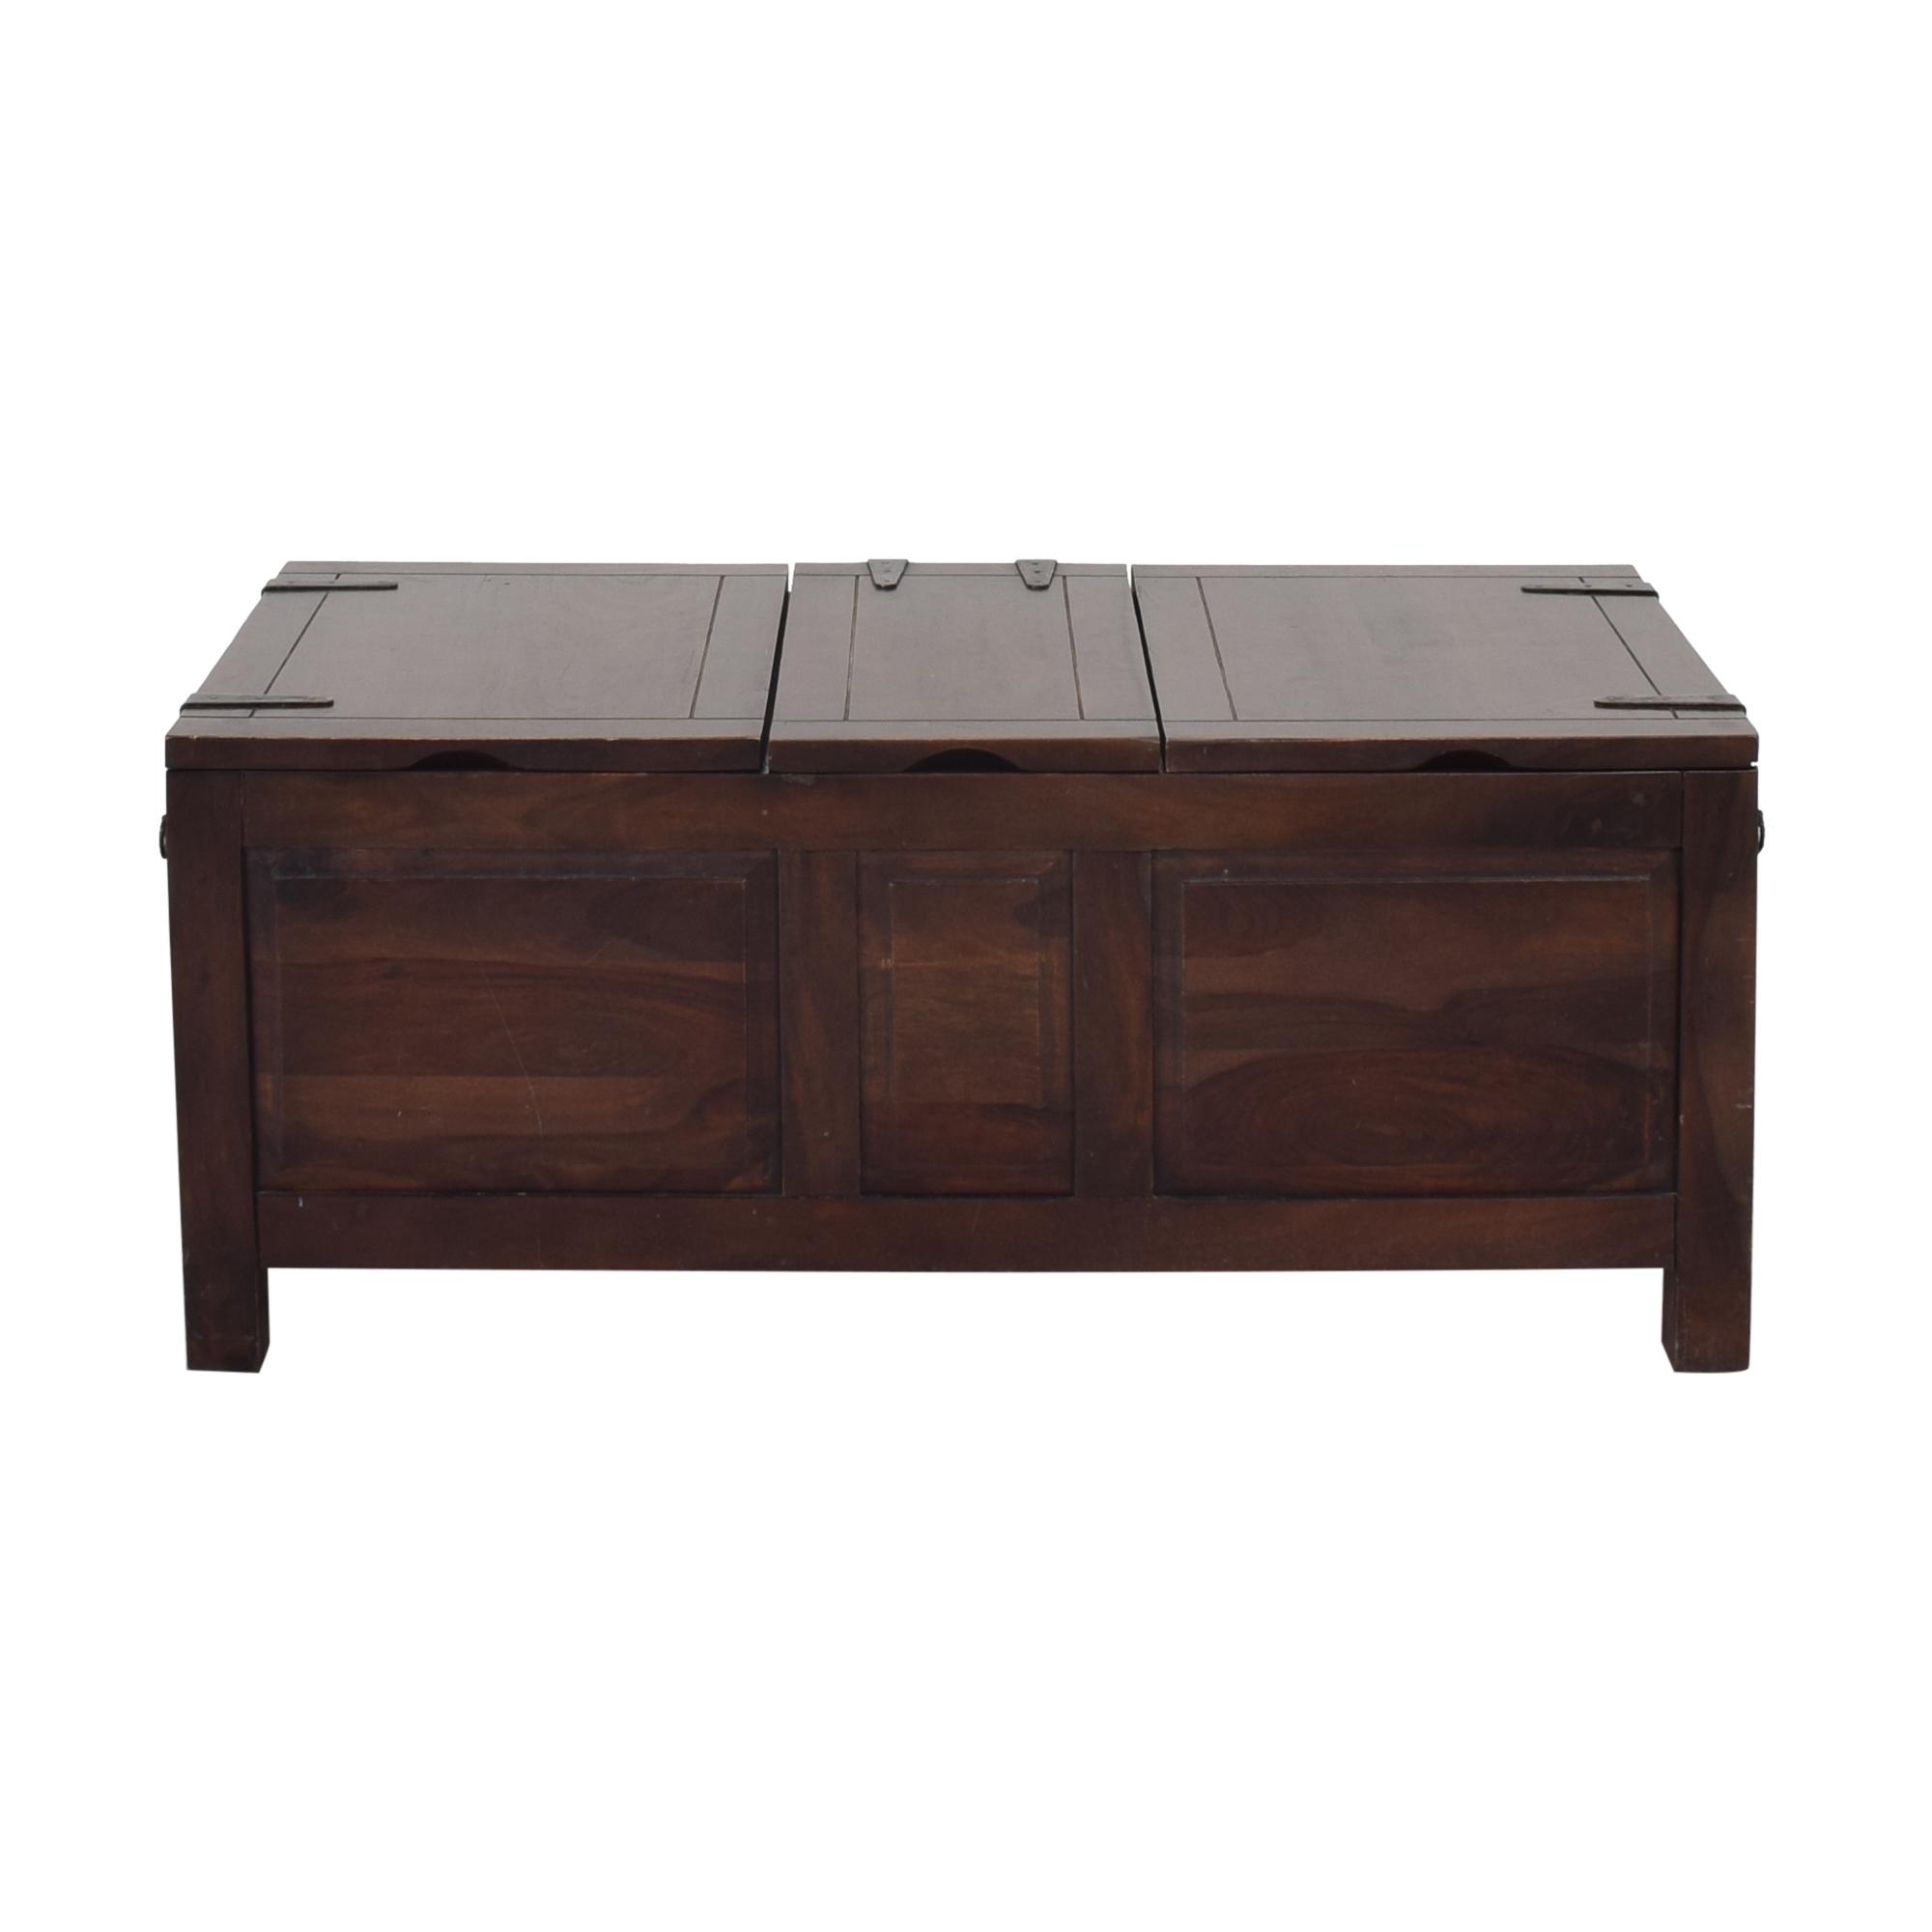 Crate & Barrel Crate & Barrel Hunter II Trunk Table Storage